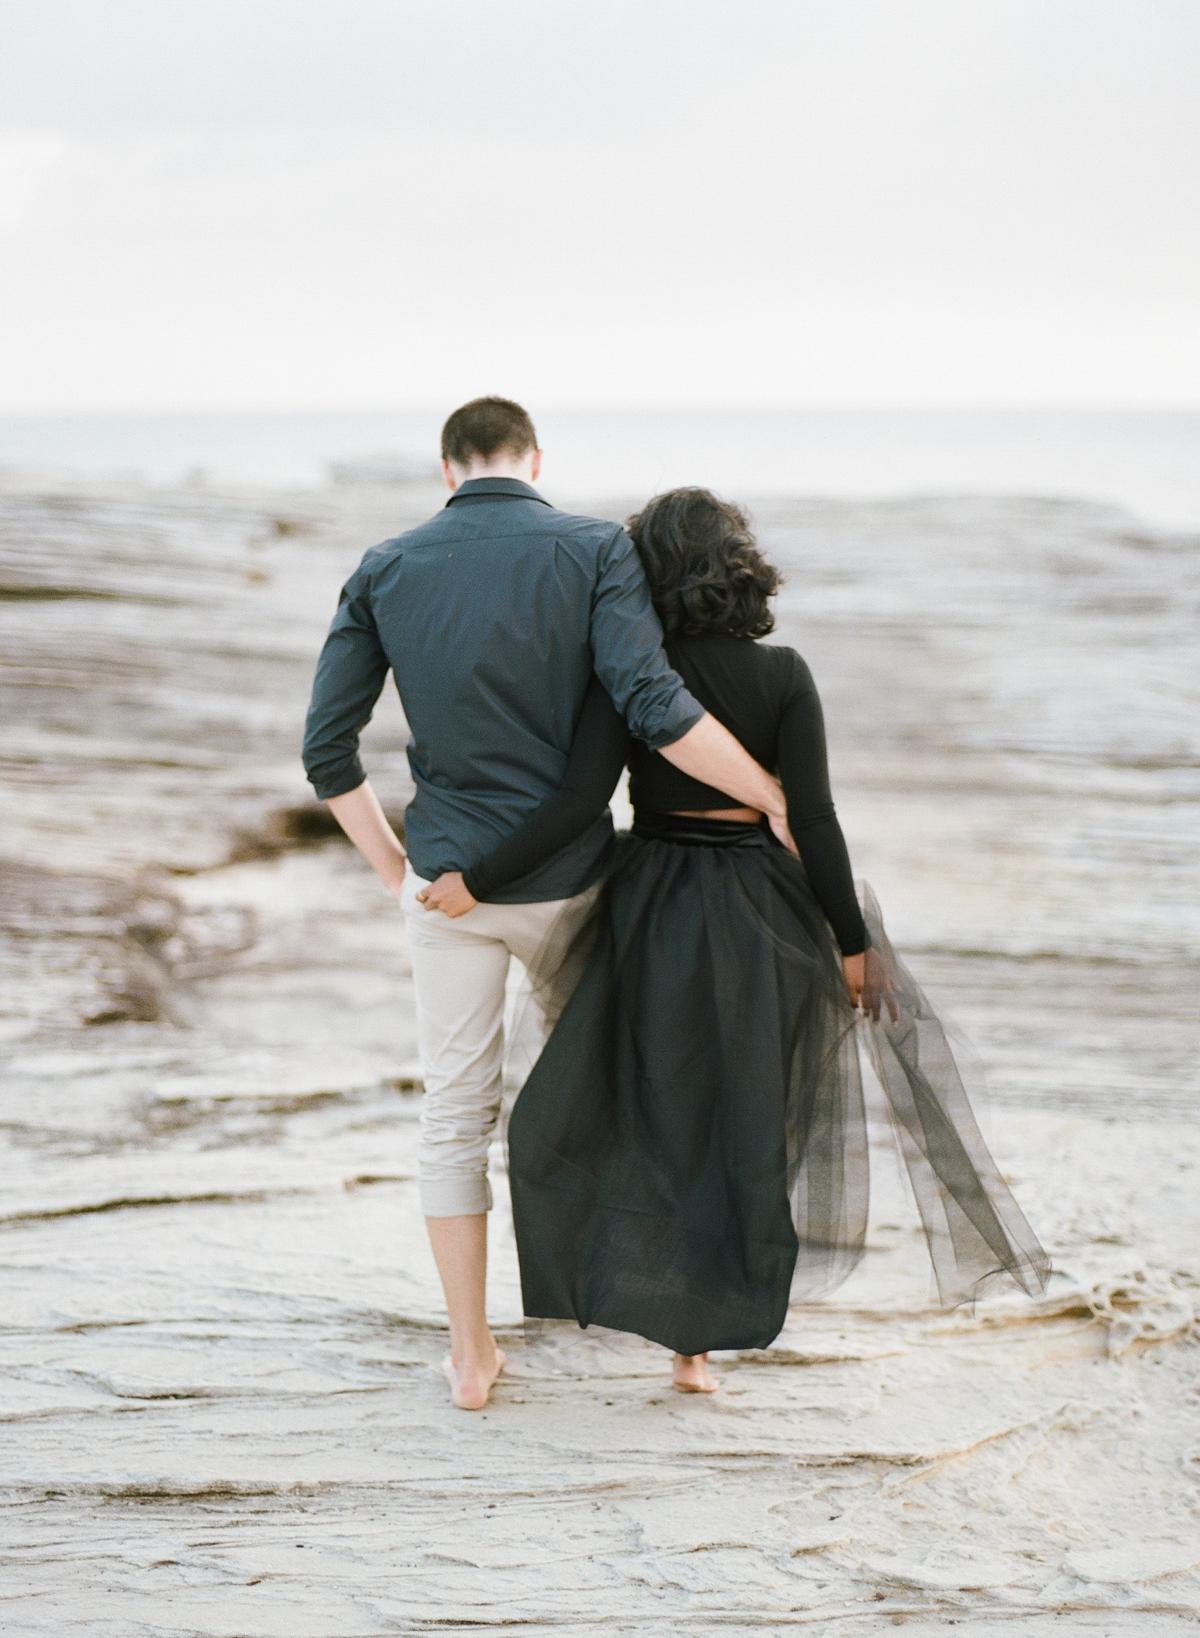 Coastal Sydney couples session by Mr Edwards Photography_0737_1147.jpg